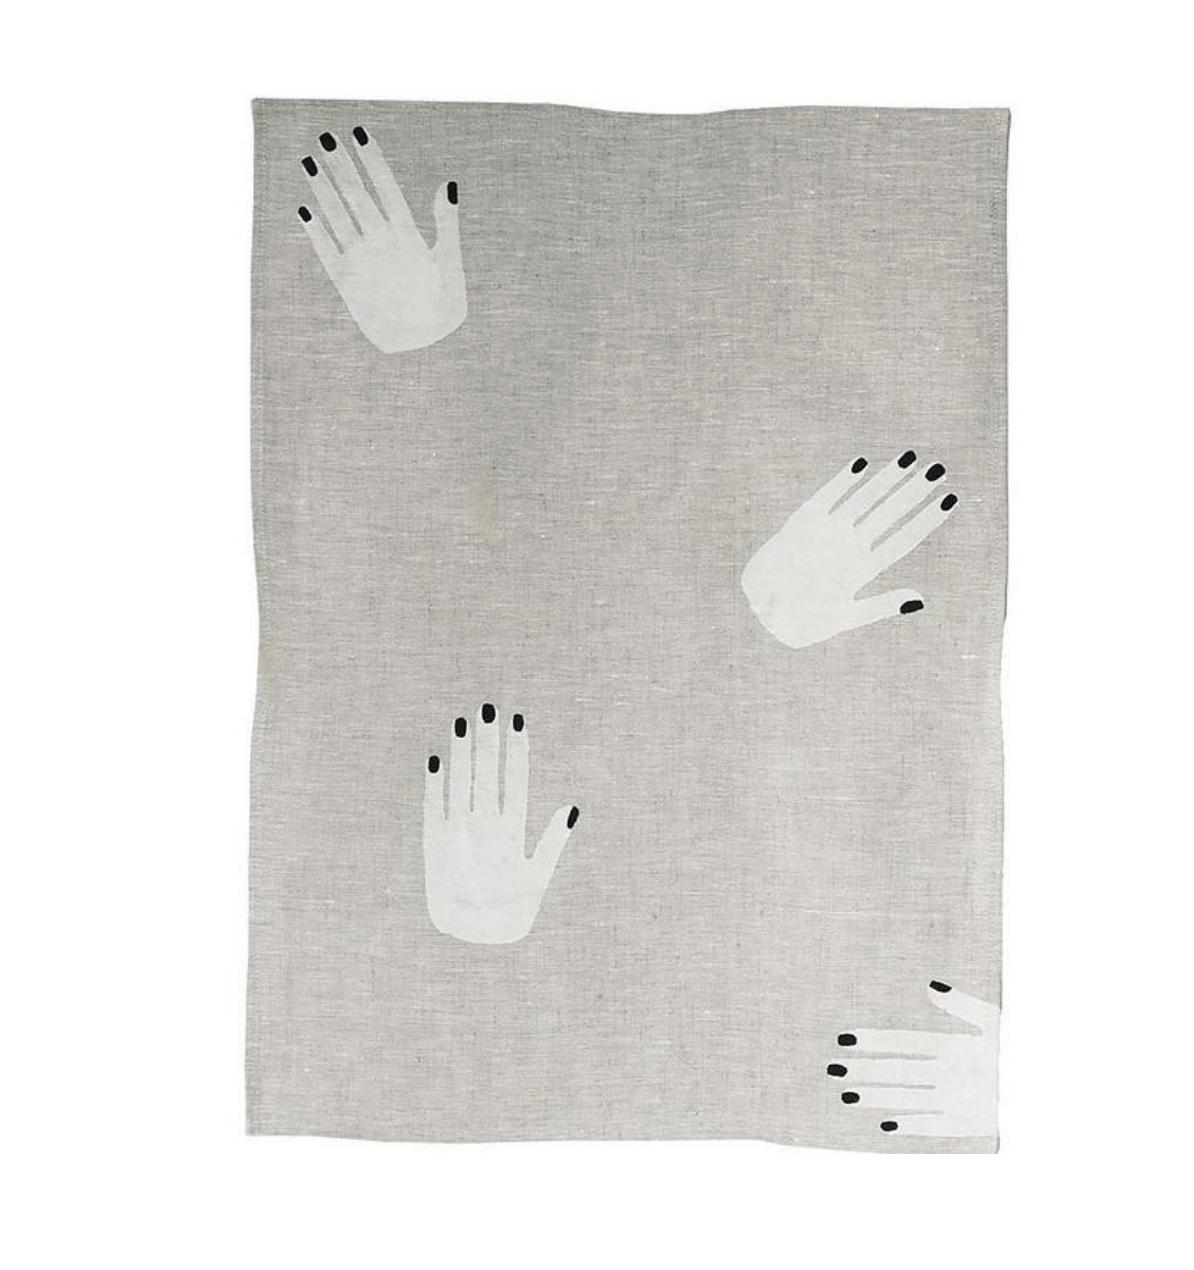 Hands off linen tea towel by  Fazeek